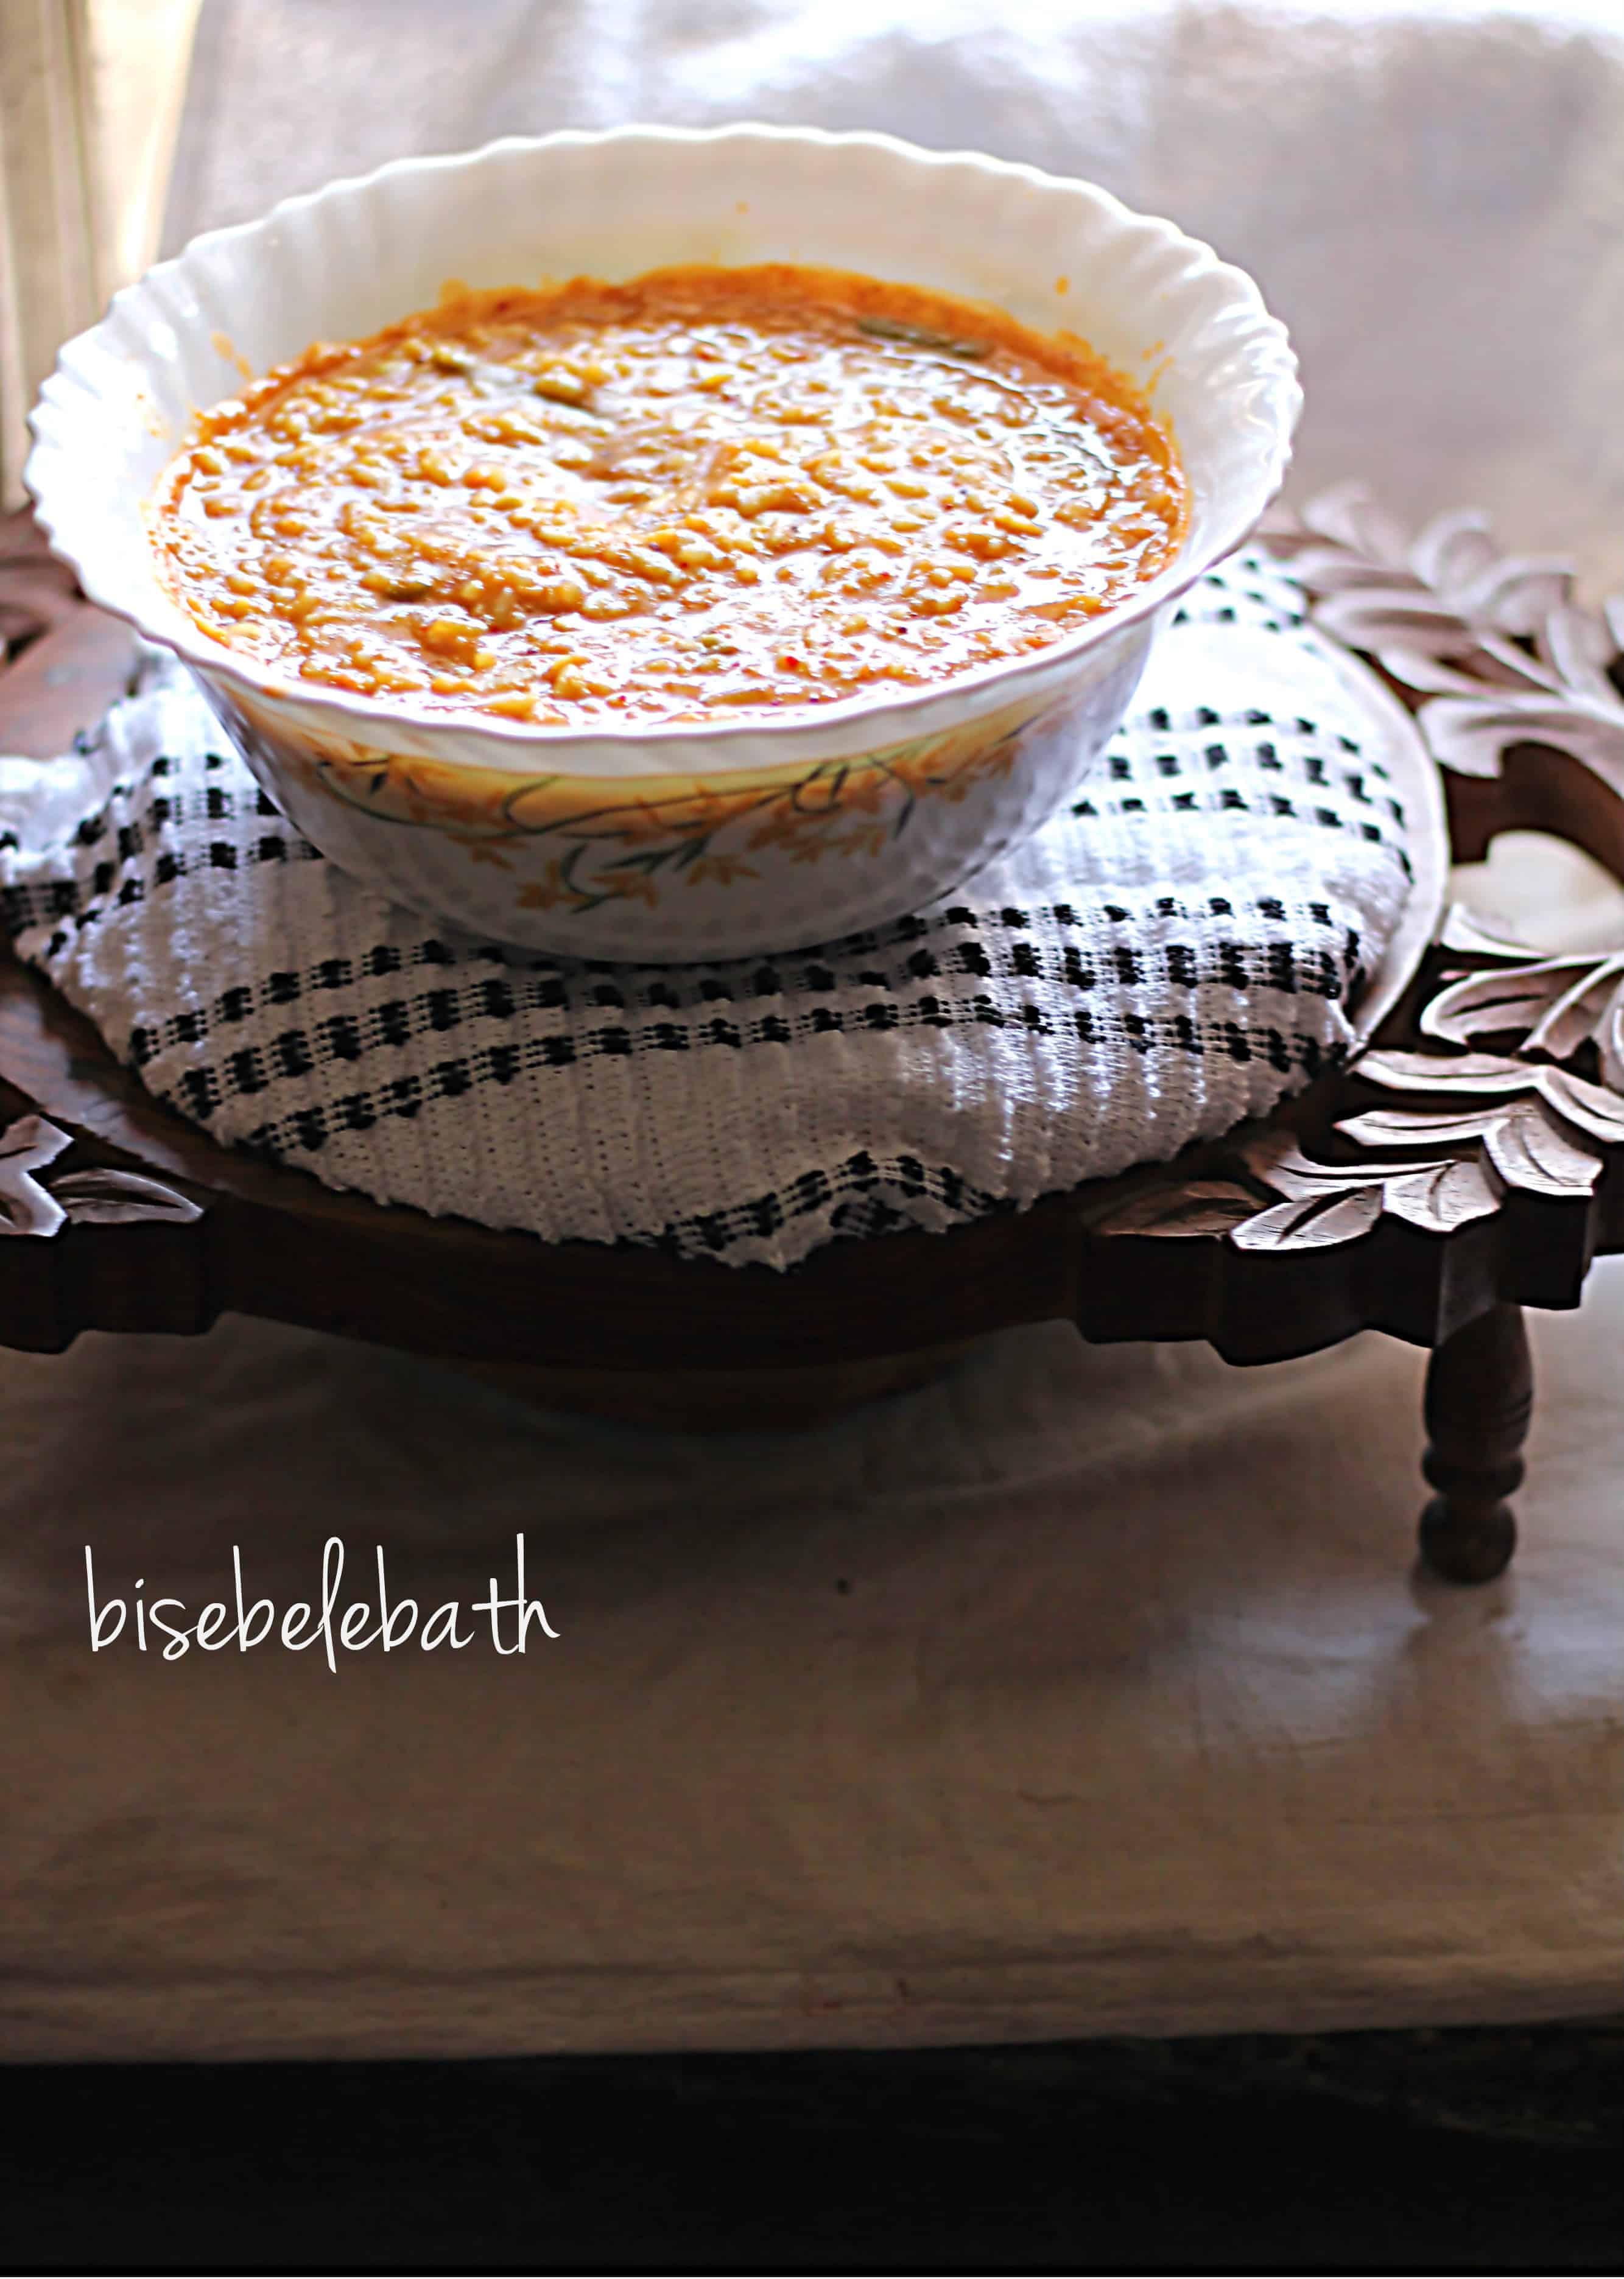 bisebelebath bisebelebath Bisebelebath, popular karnataka recipe bisebelebath1